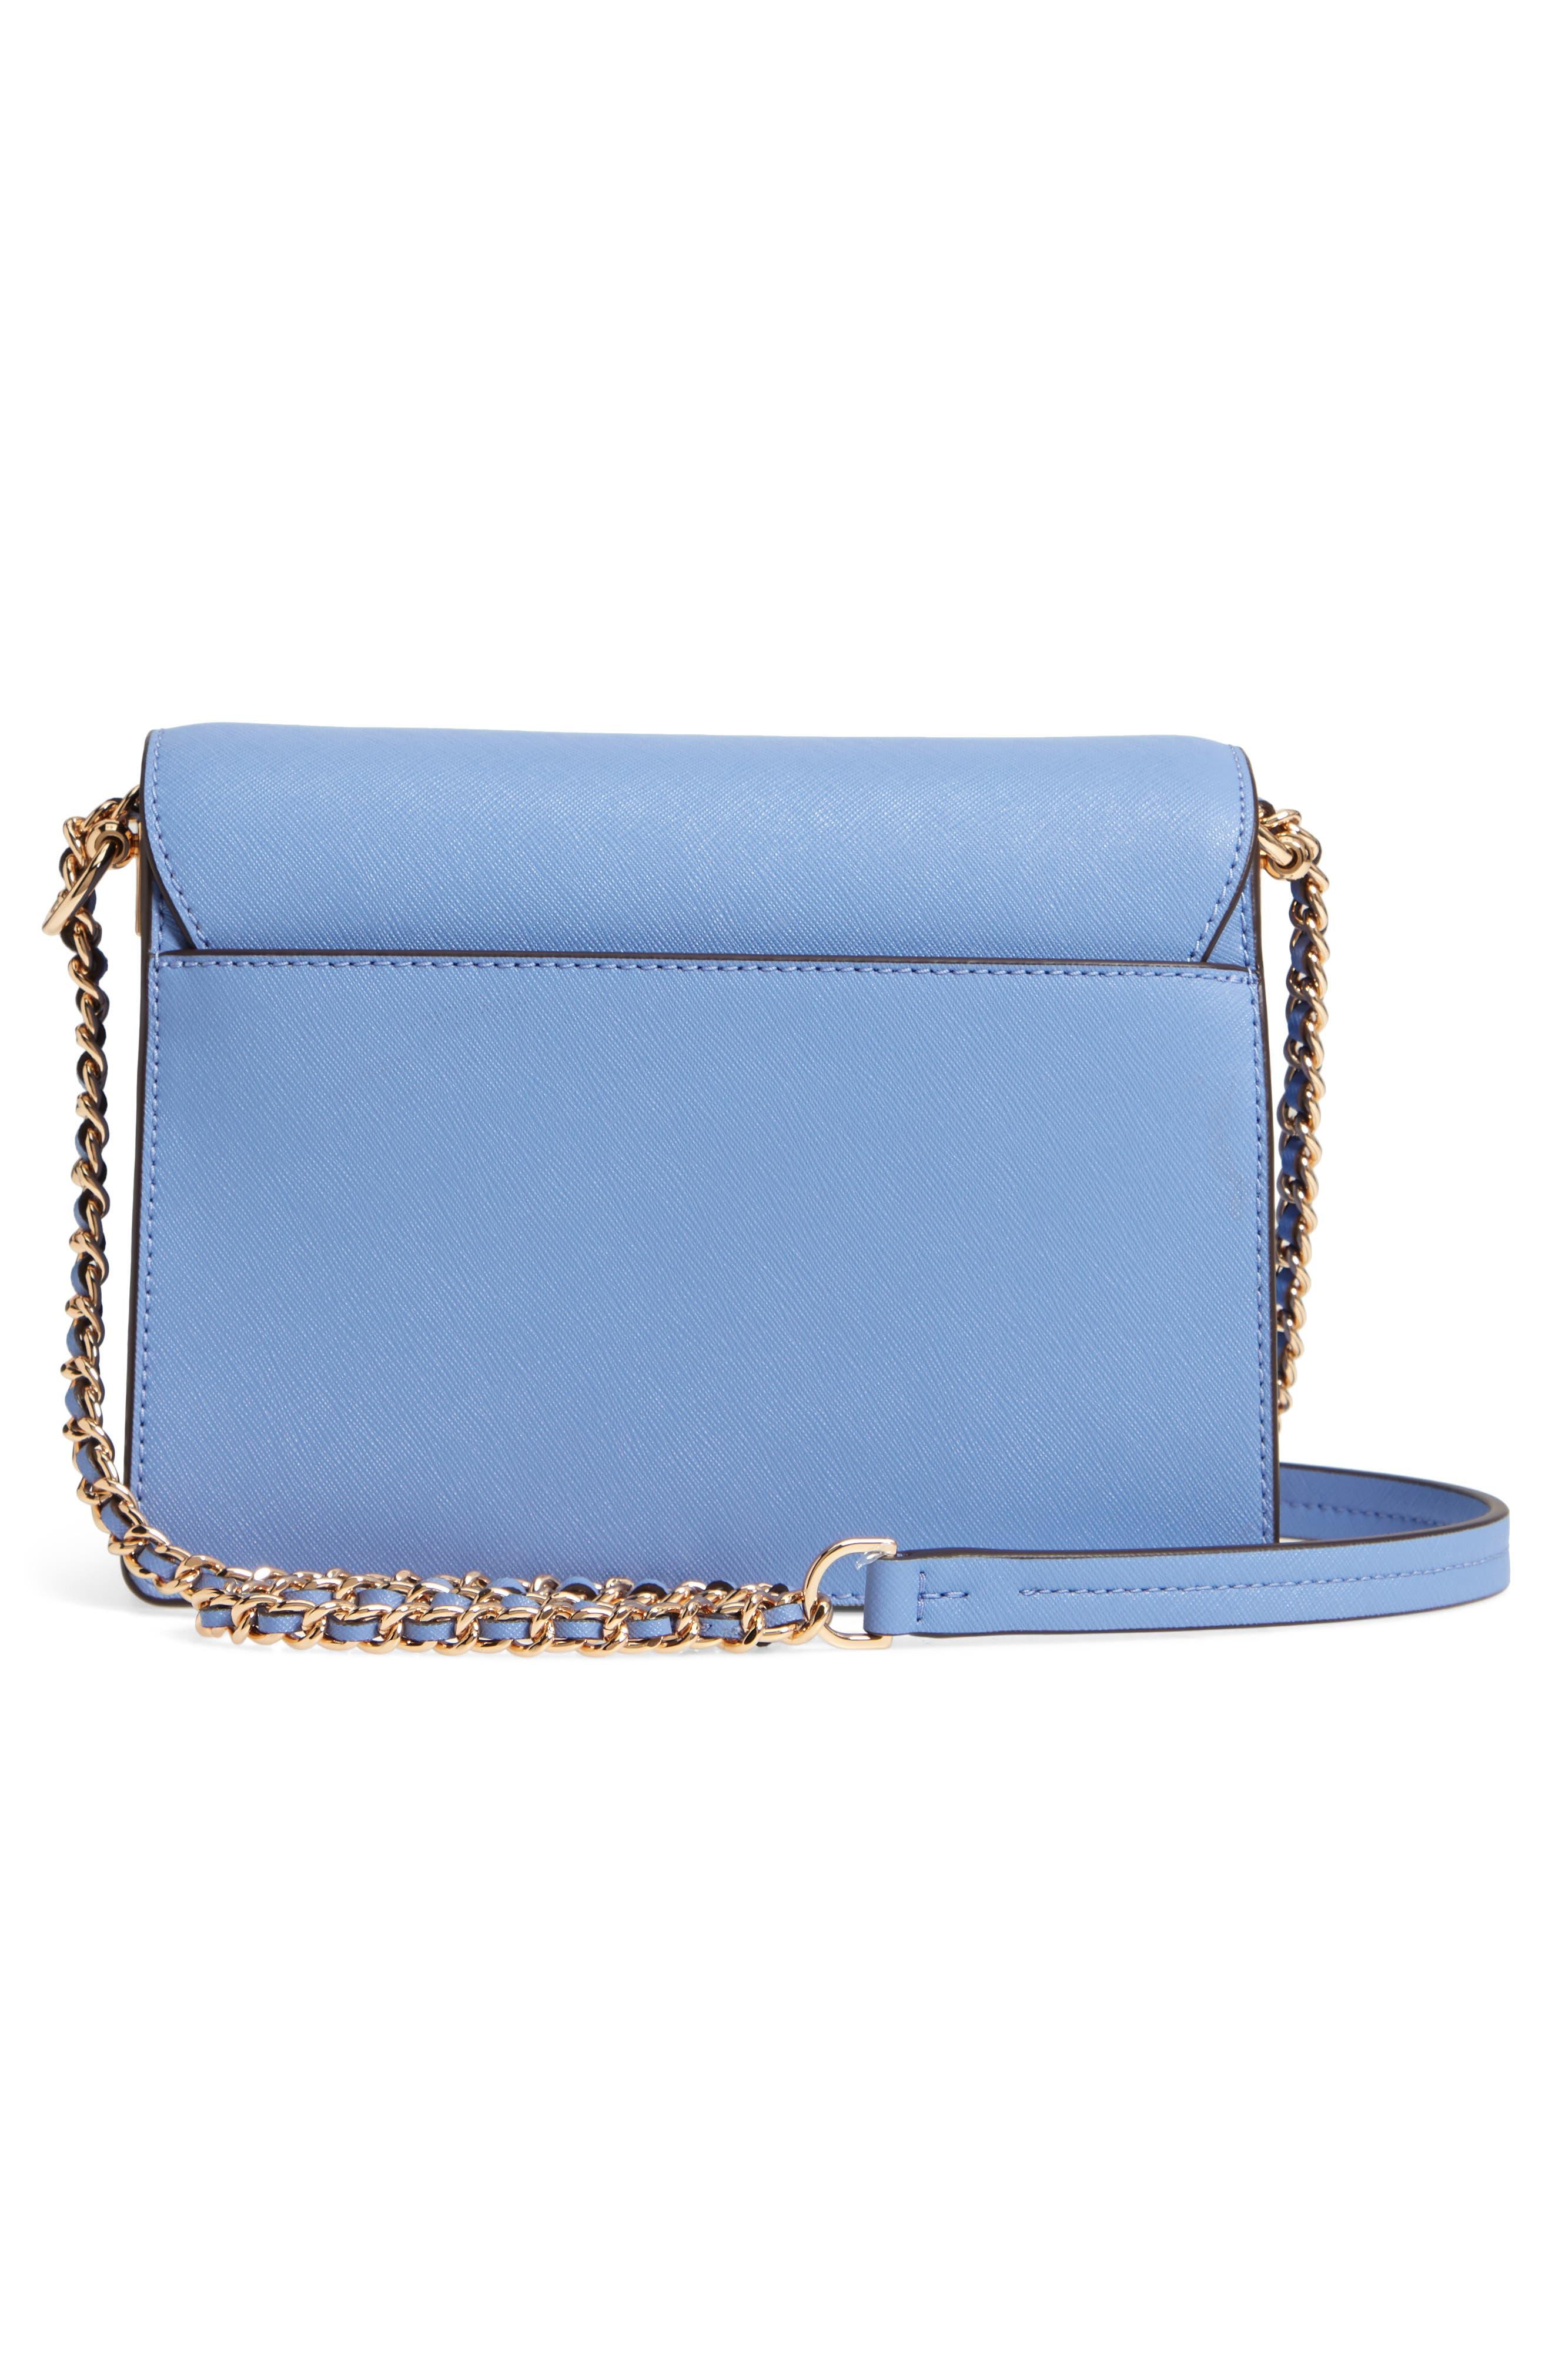 Robinson Convertible Leather Shoulder Bag,                             Alternate thumbnail 7, color,                             Bow Blue